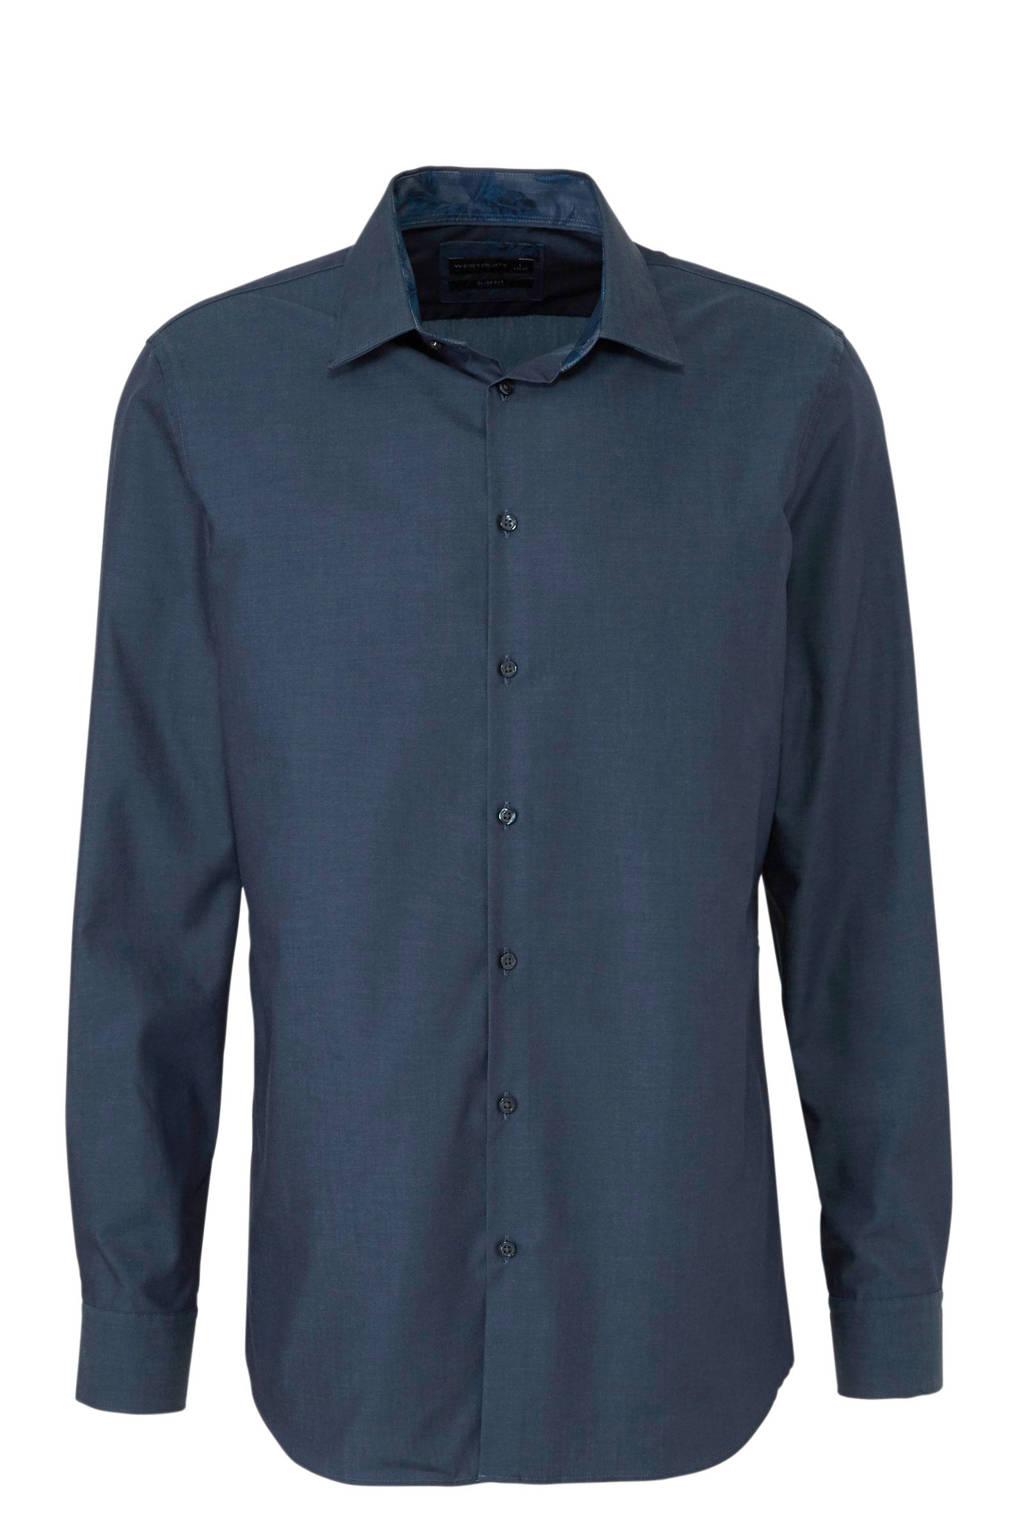 Donkerblauw Overhemd.C A Overhemd Donkerblauw Wehkamp